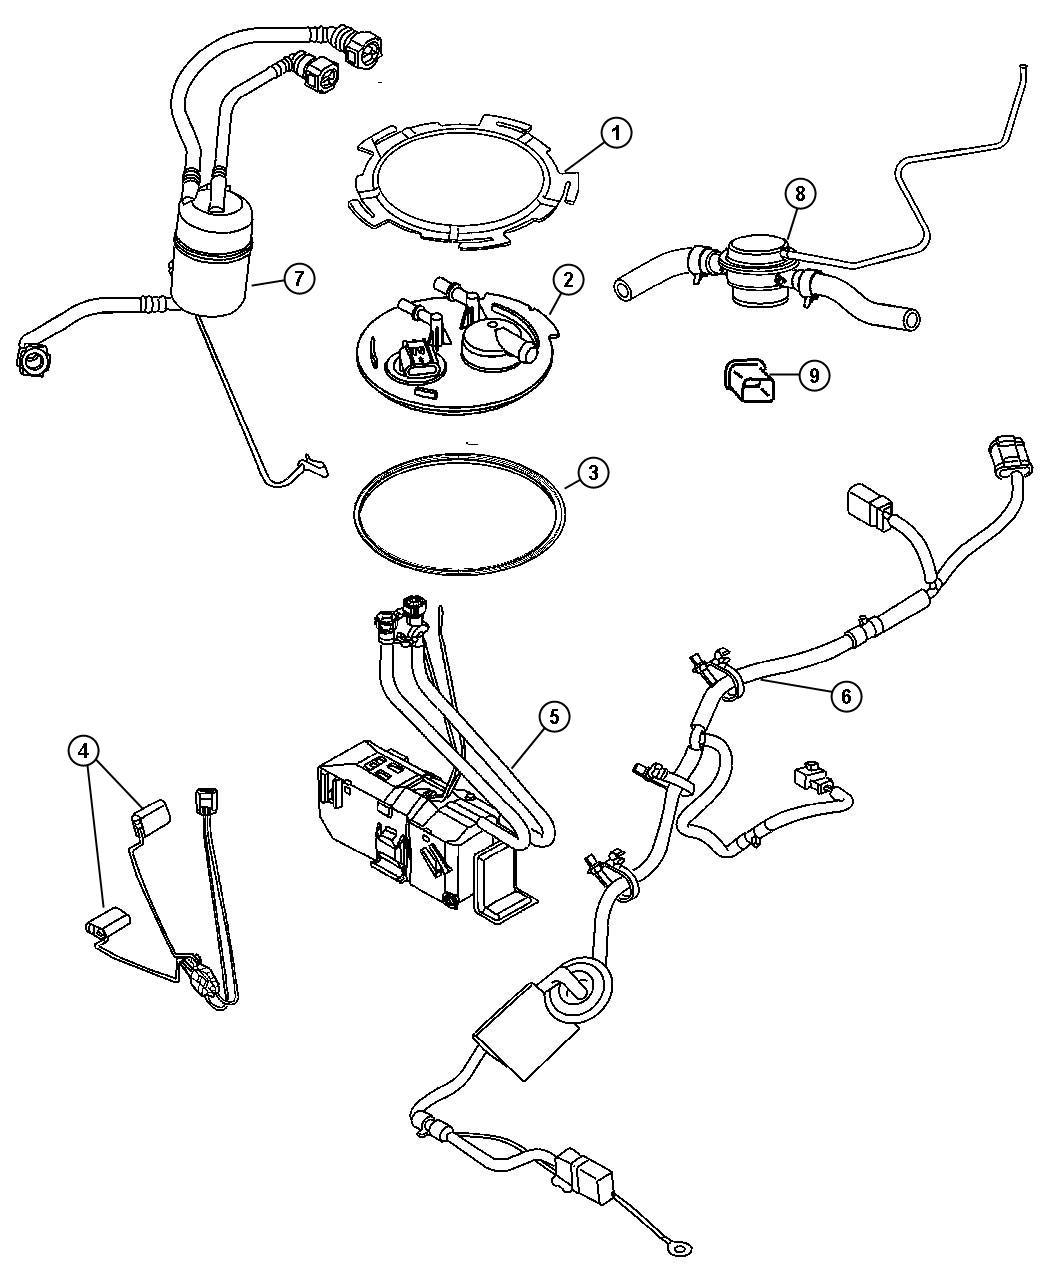 Jeep Liberty Reservoir package. Fuel. [edo or eko] before